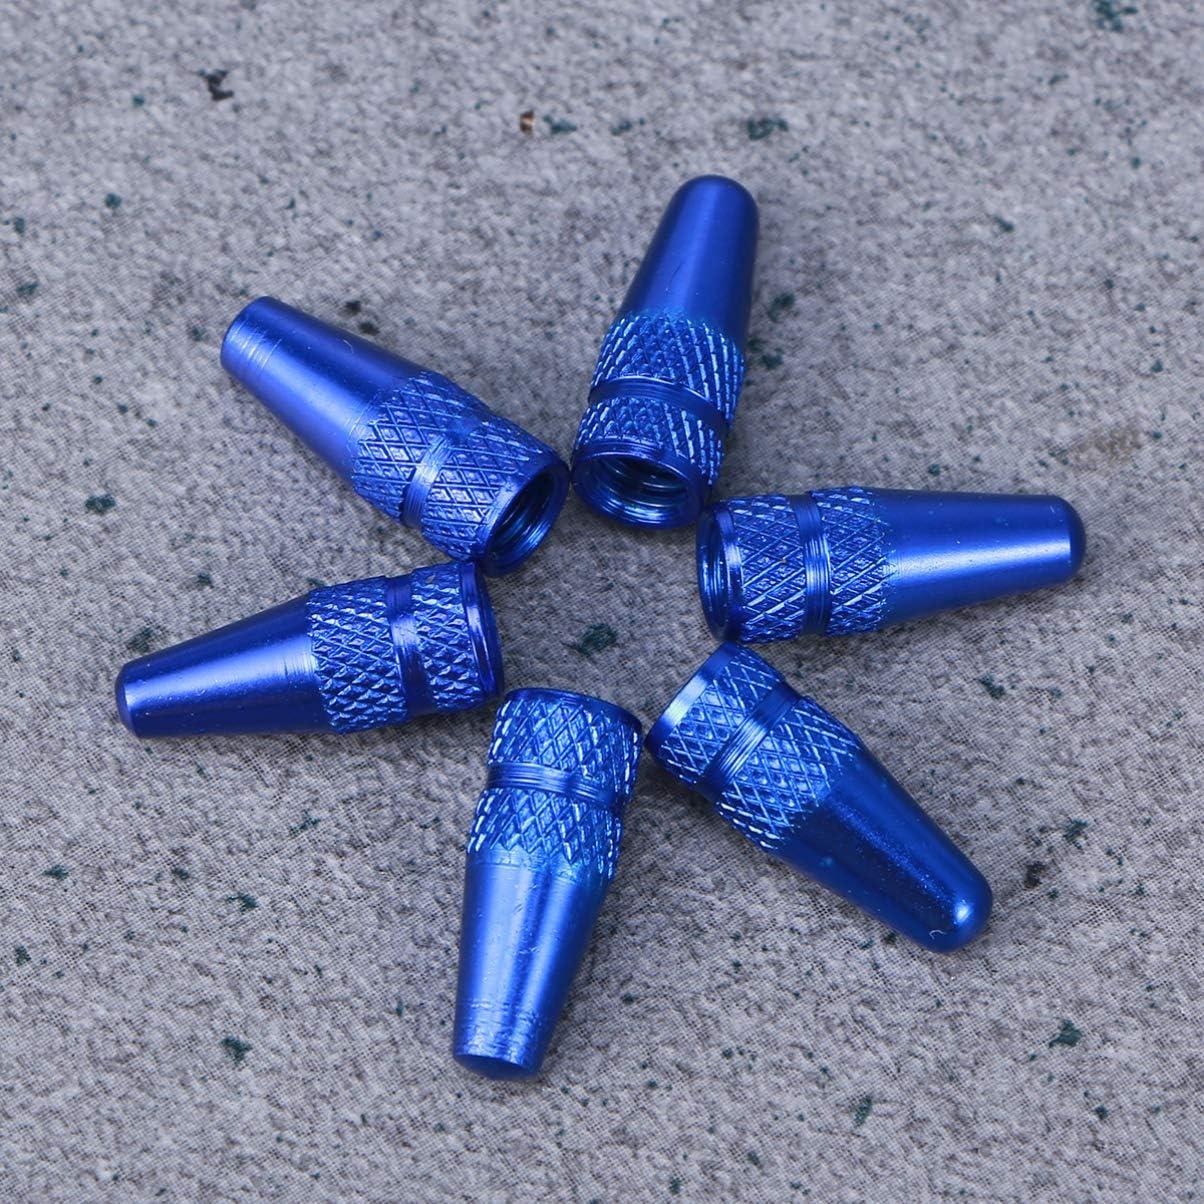 LIOOBO 6 unids Bicicleta Tapas de V/álvulas de Aleaci/ón de Aluminio Estilo Franc/és Bicicleta Bicicleta Neum/áticos Tapas de V/álvulas Cubre Polvo Azul